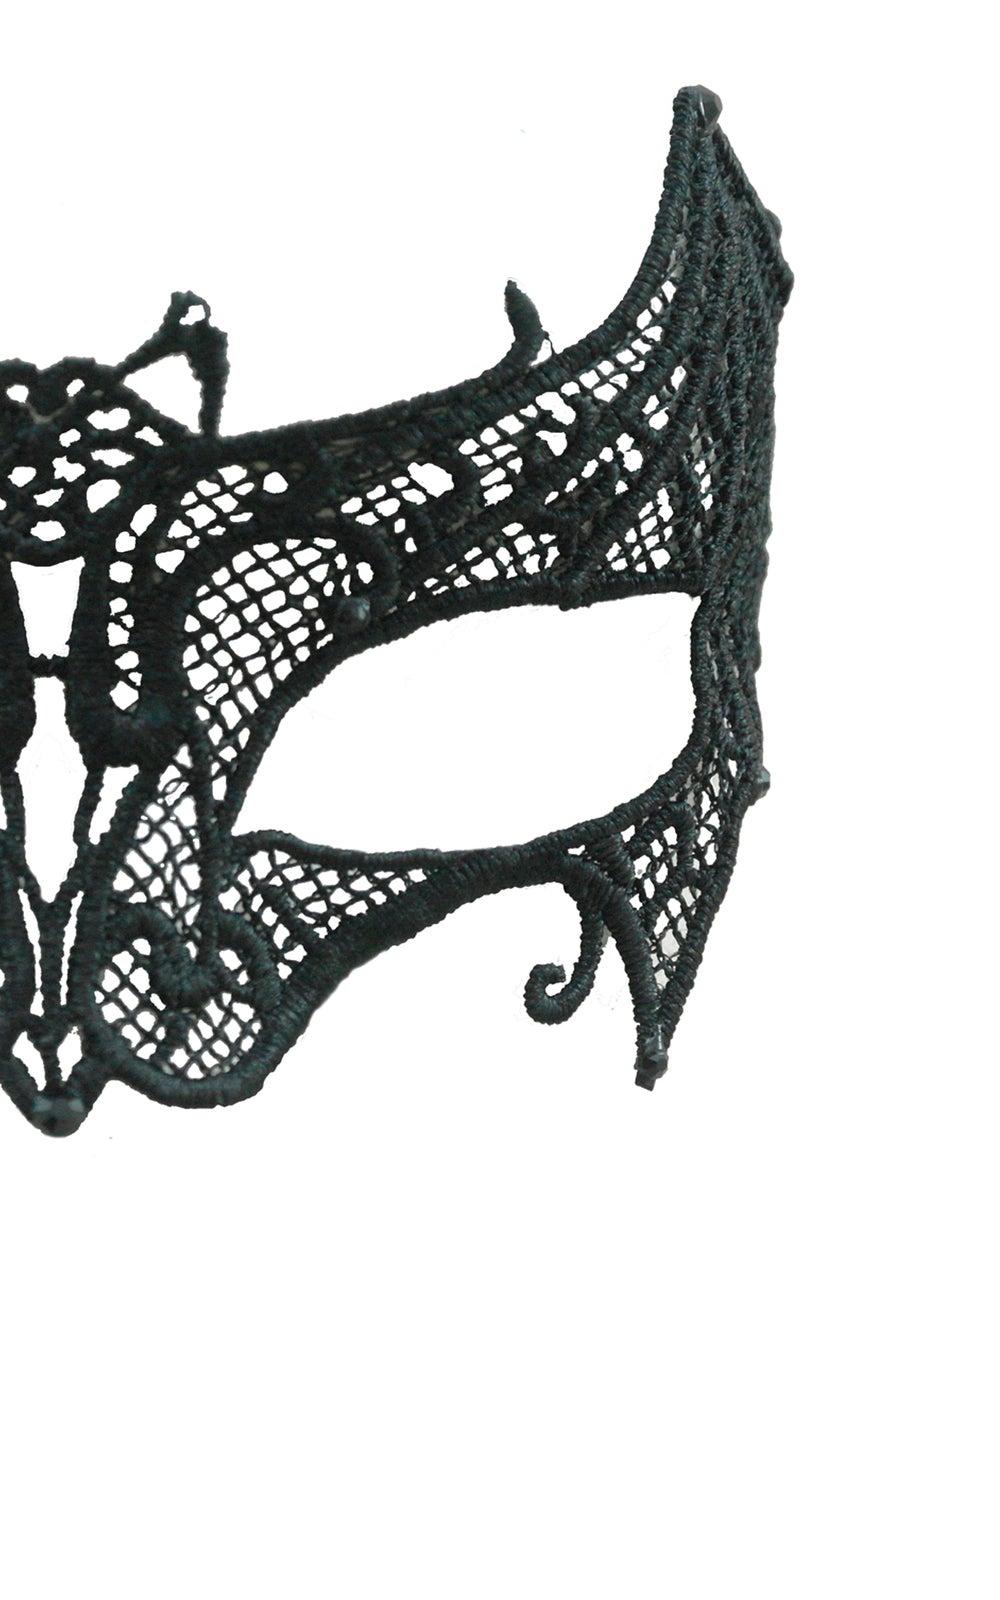 Image of Bat Girl Masquerade Mask